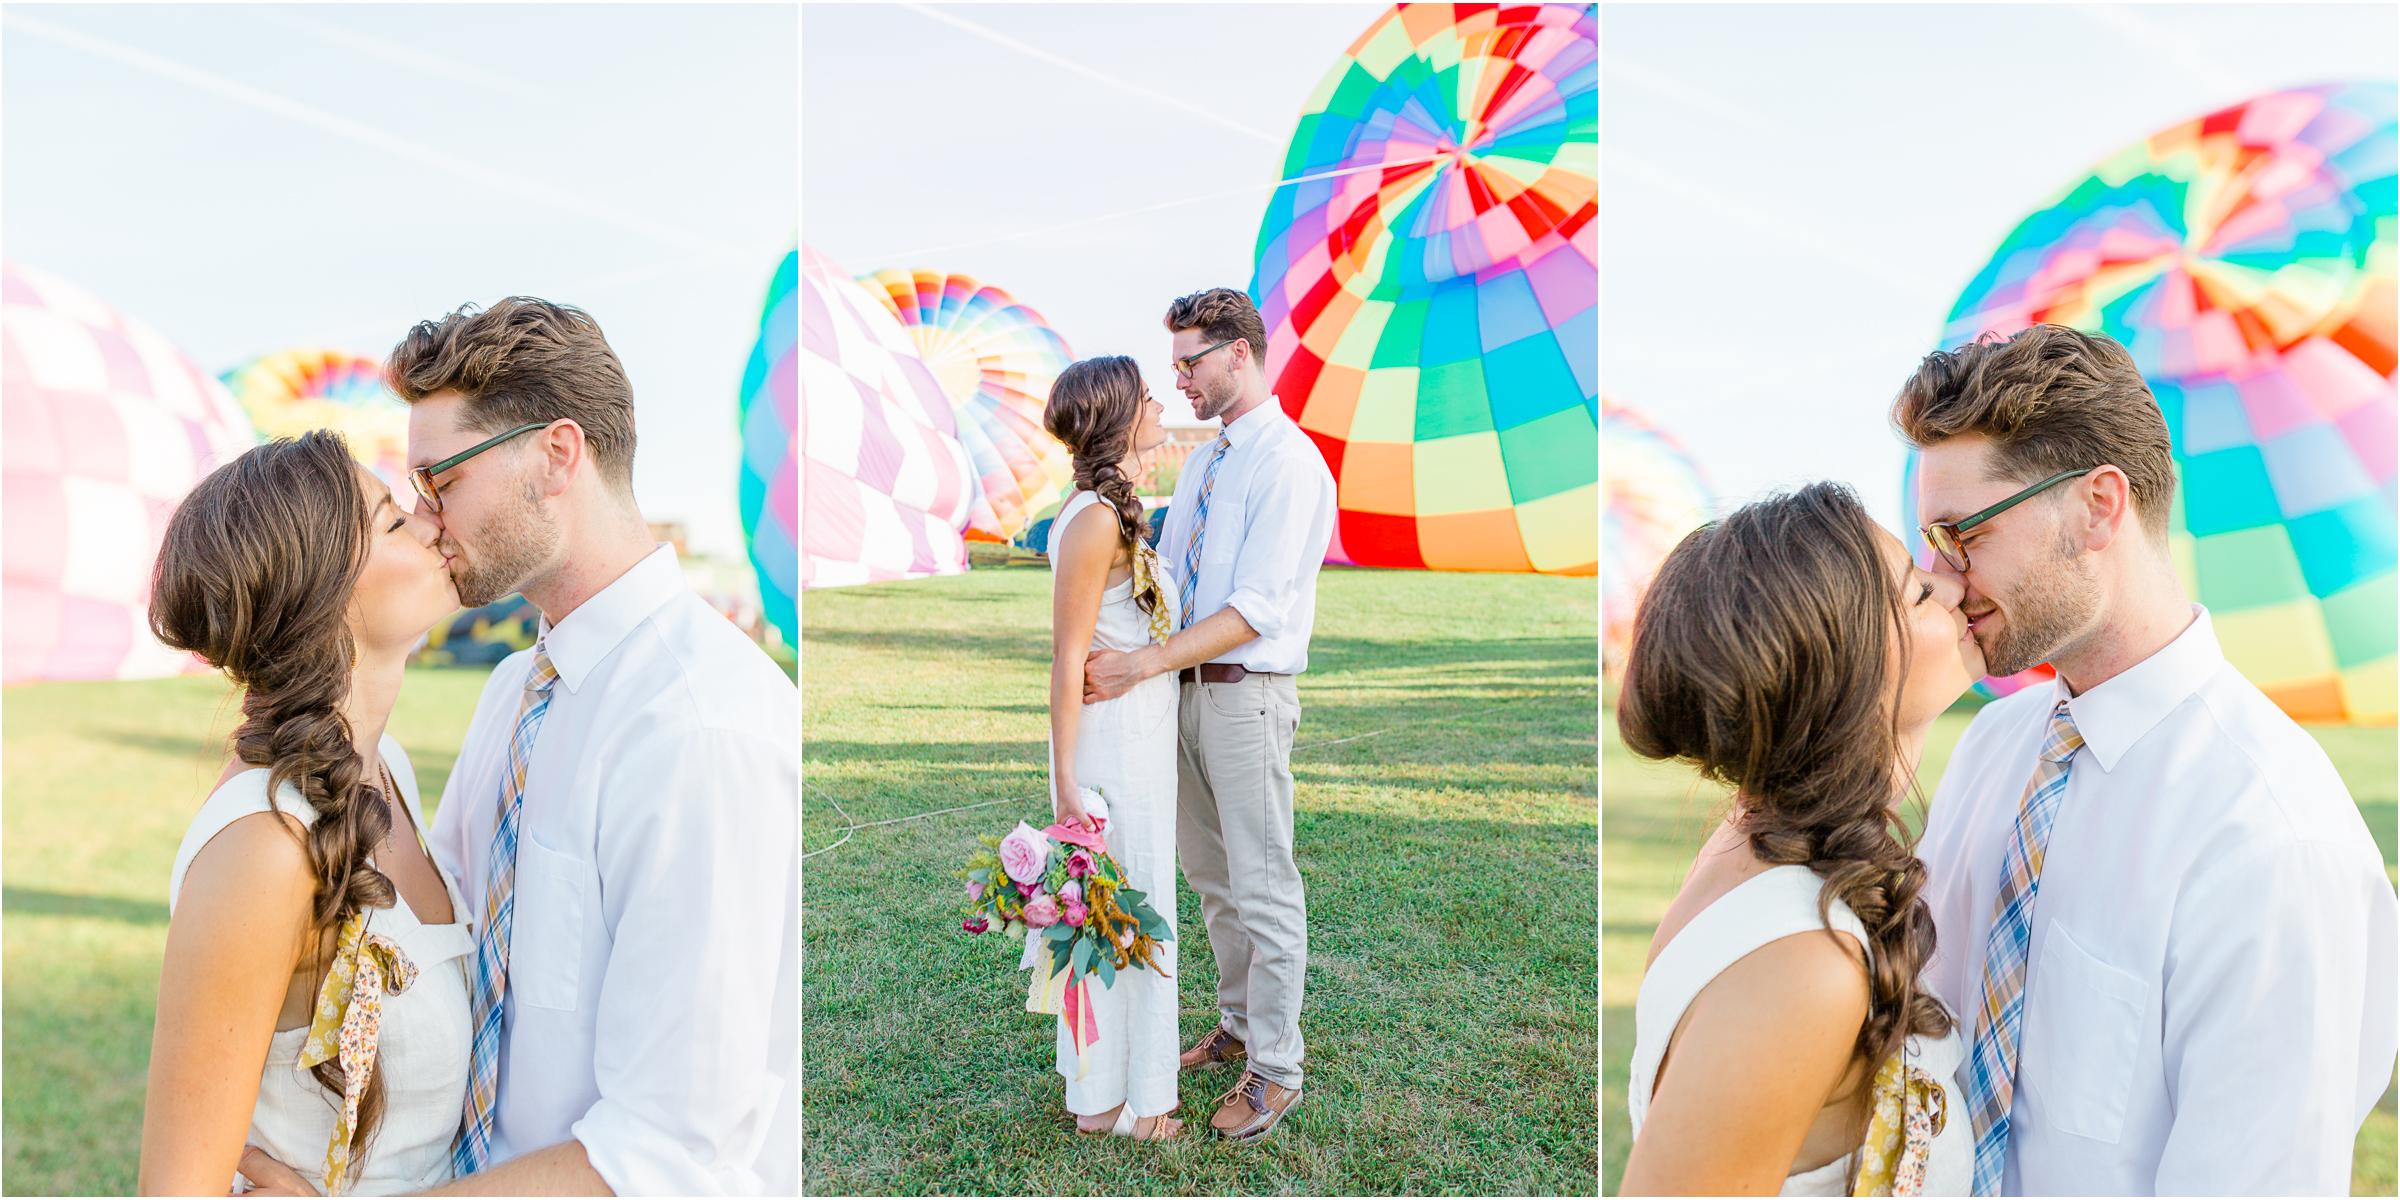 Maine Fine Art Wedding Photographer 18.jpg